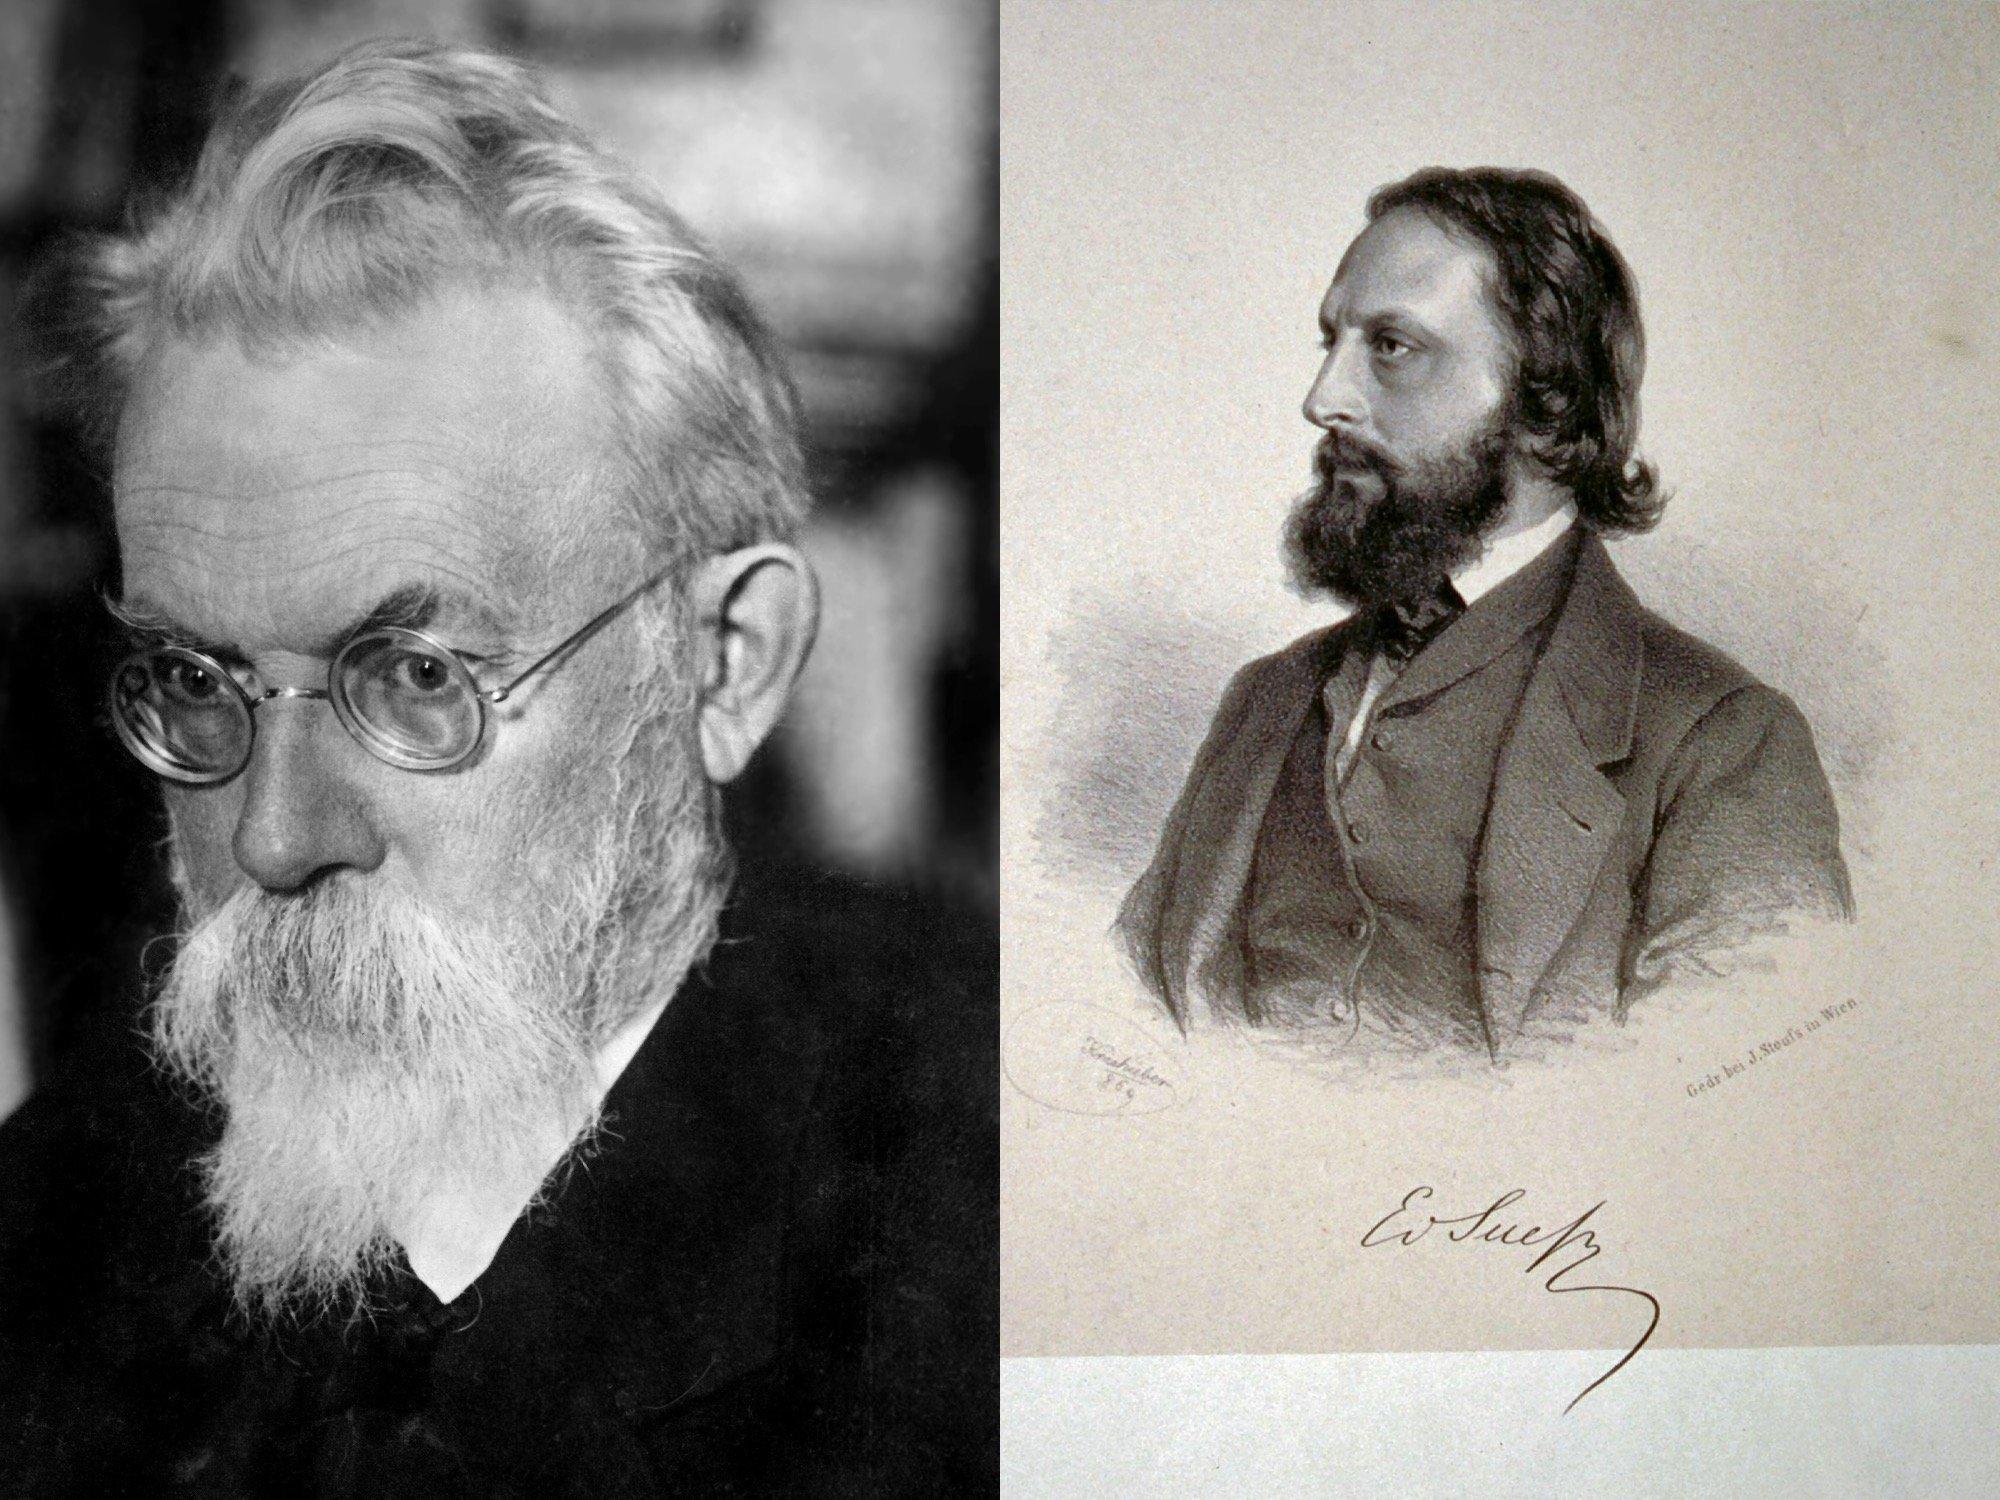 Zwei Portraits: Rechts Österreicher Eduard Suess. Links der Russe Wernadsky.